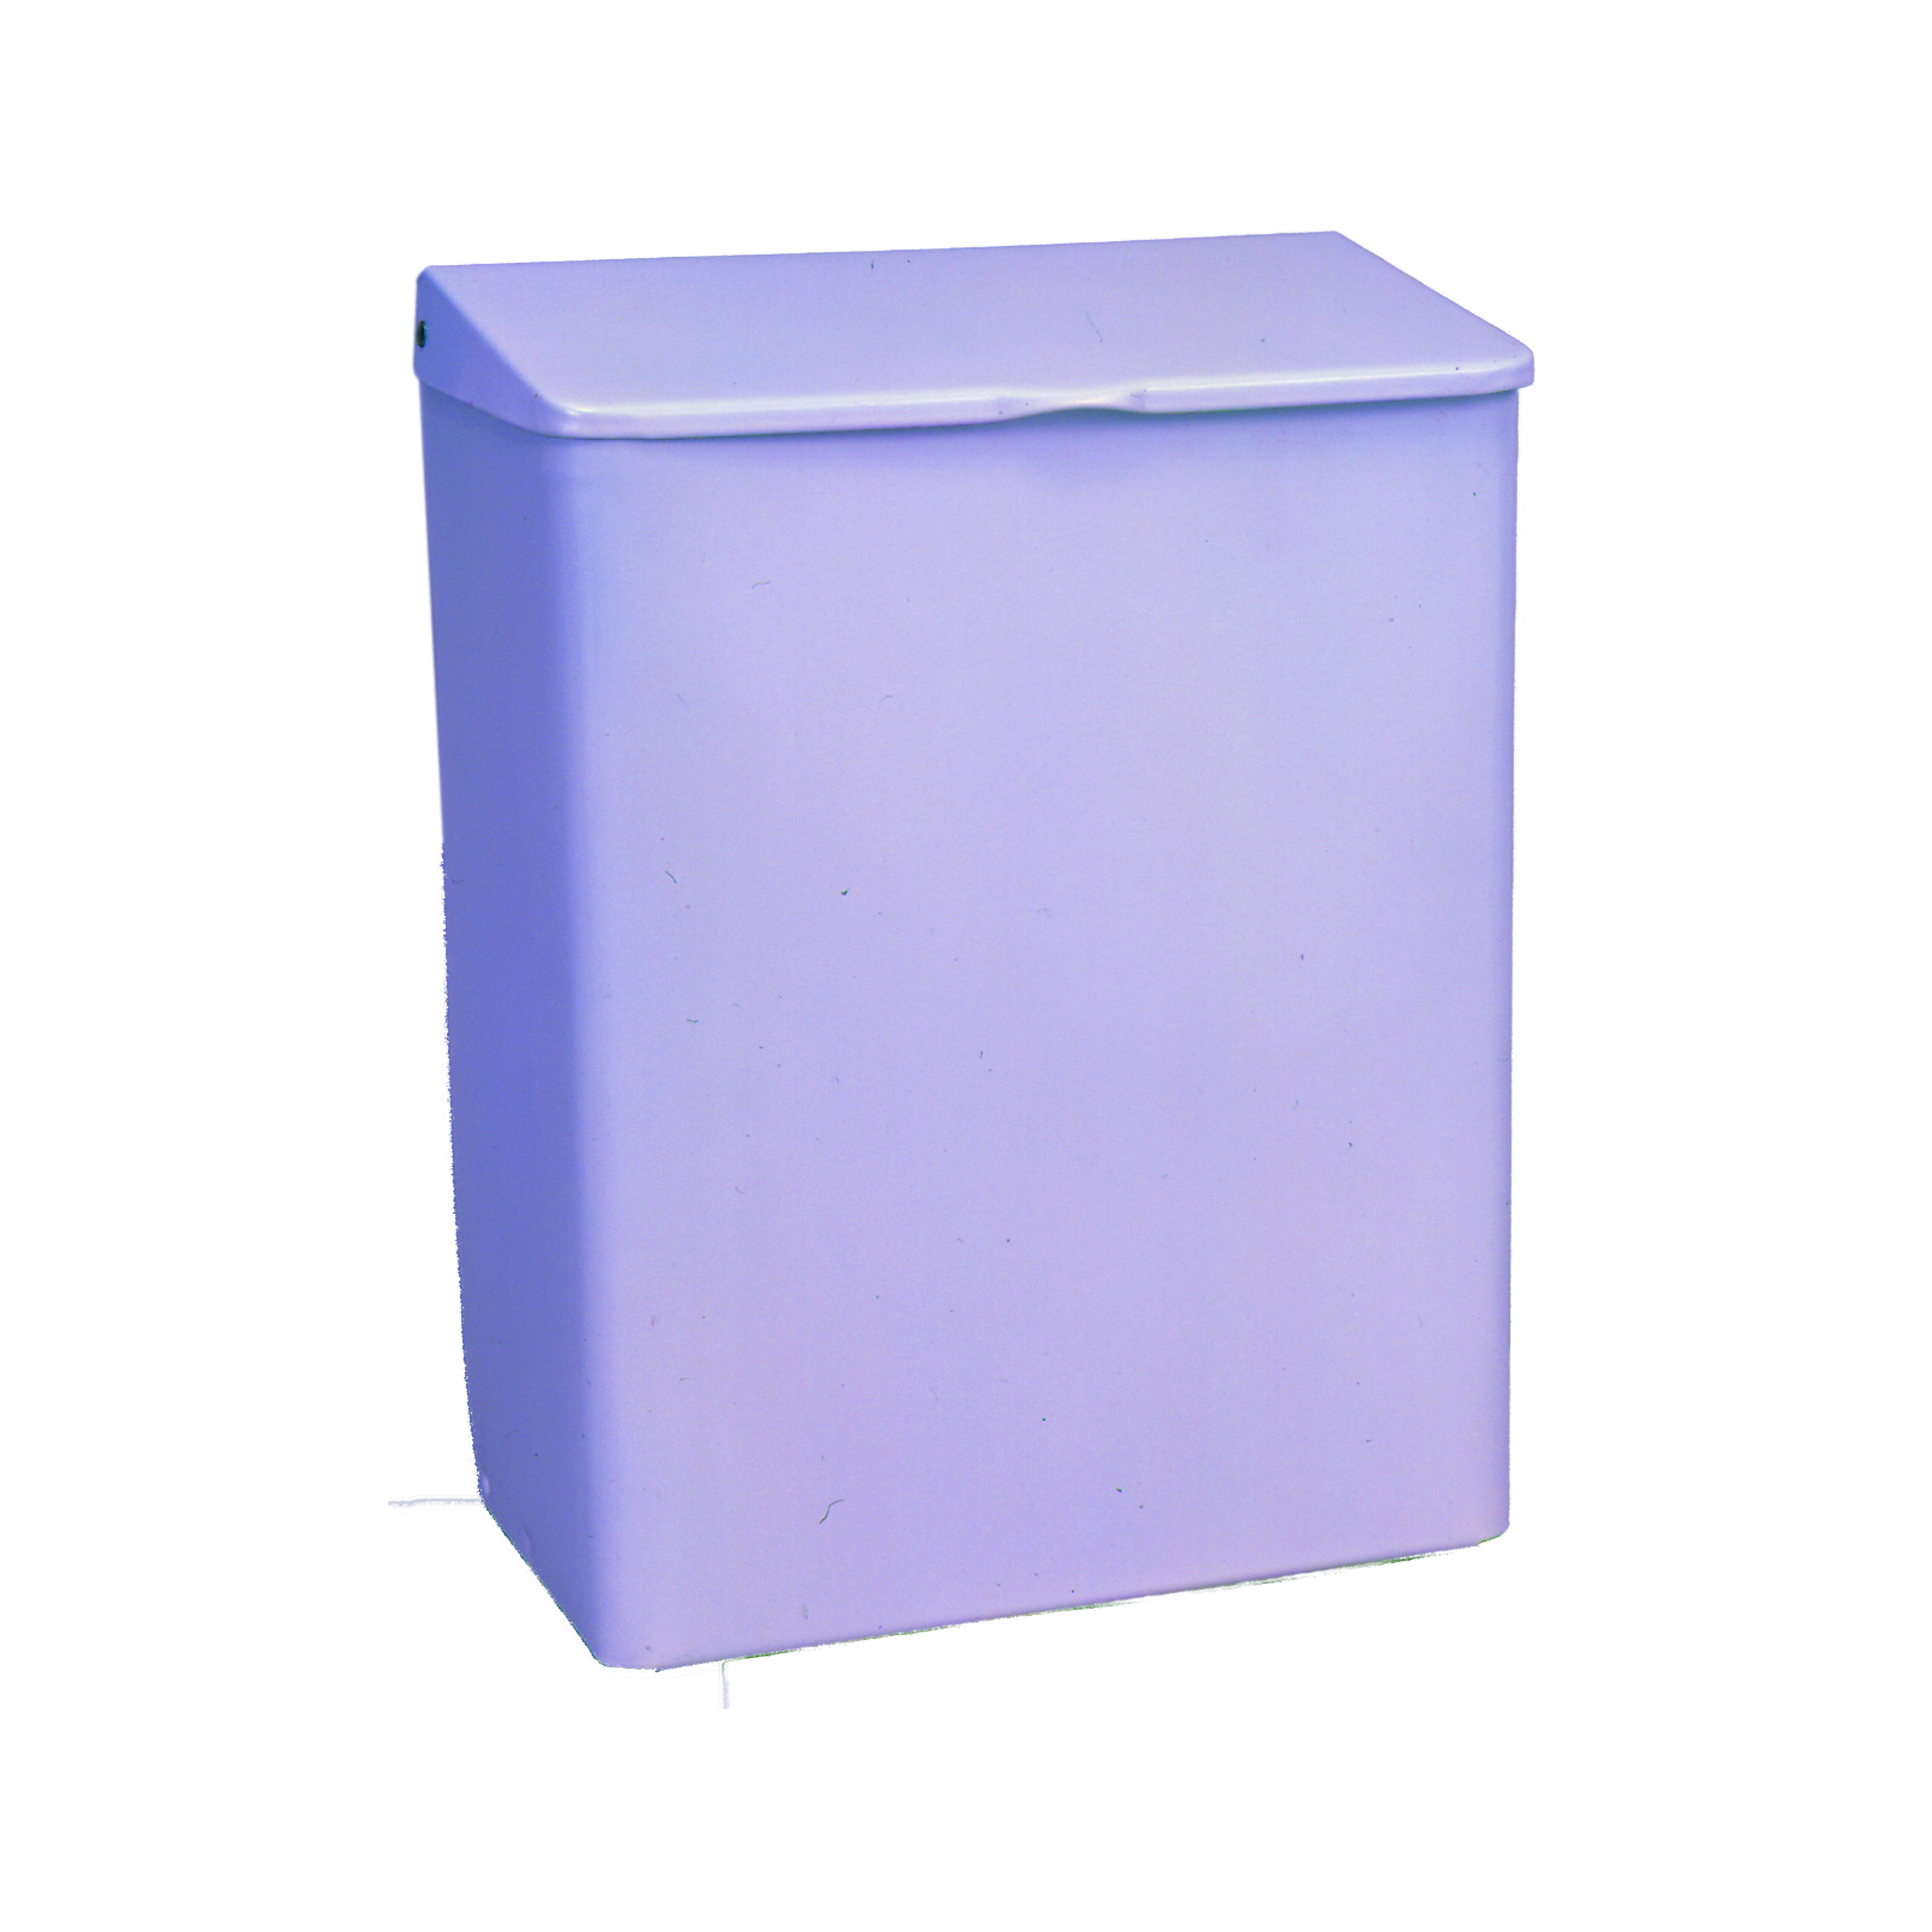 3700-99 Impact Products 25033000 sanitary napkin receptacle